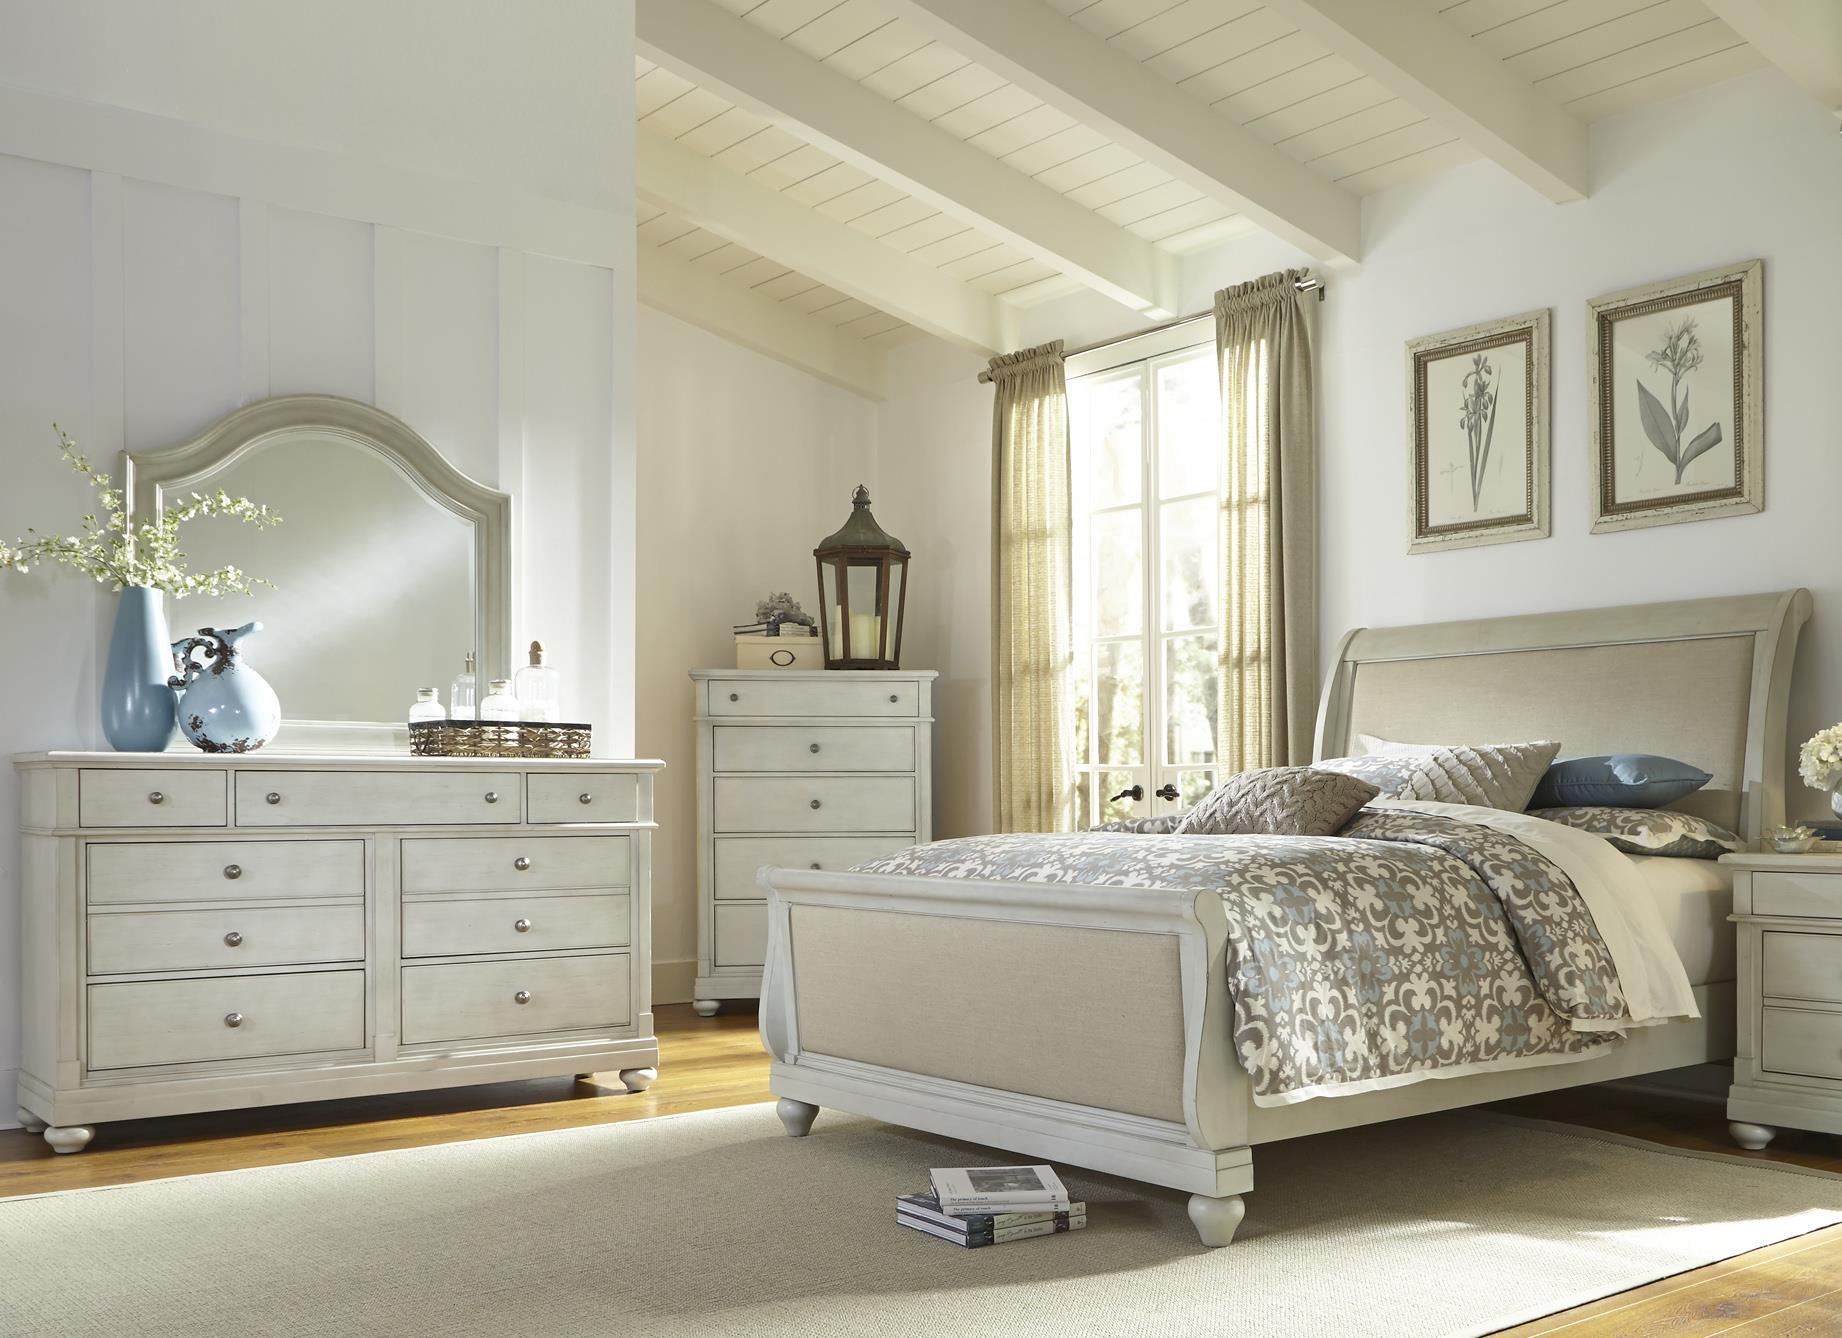 Liberty Furniture Harbor View Queen Bedroom Group - Item Number: 731-BR-QSLDMC